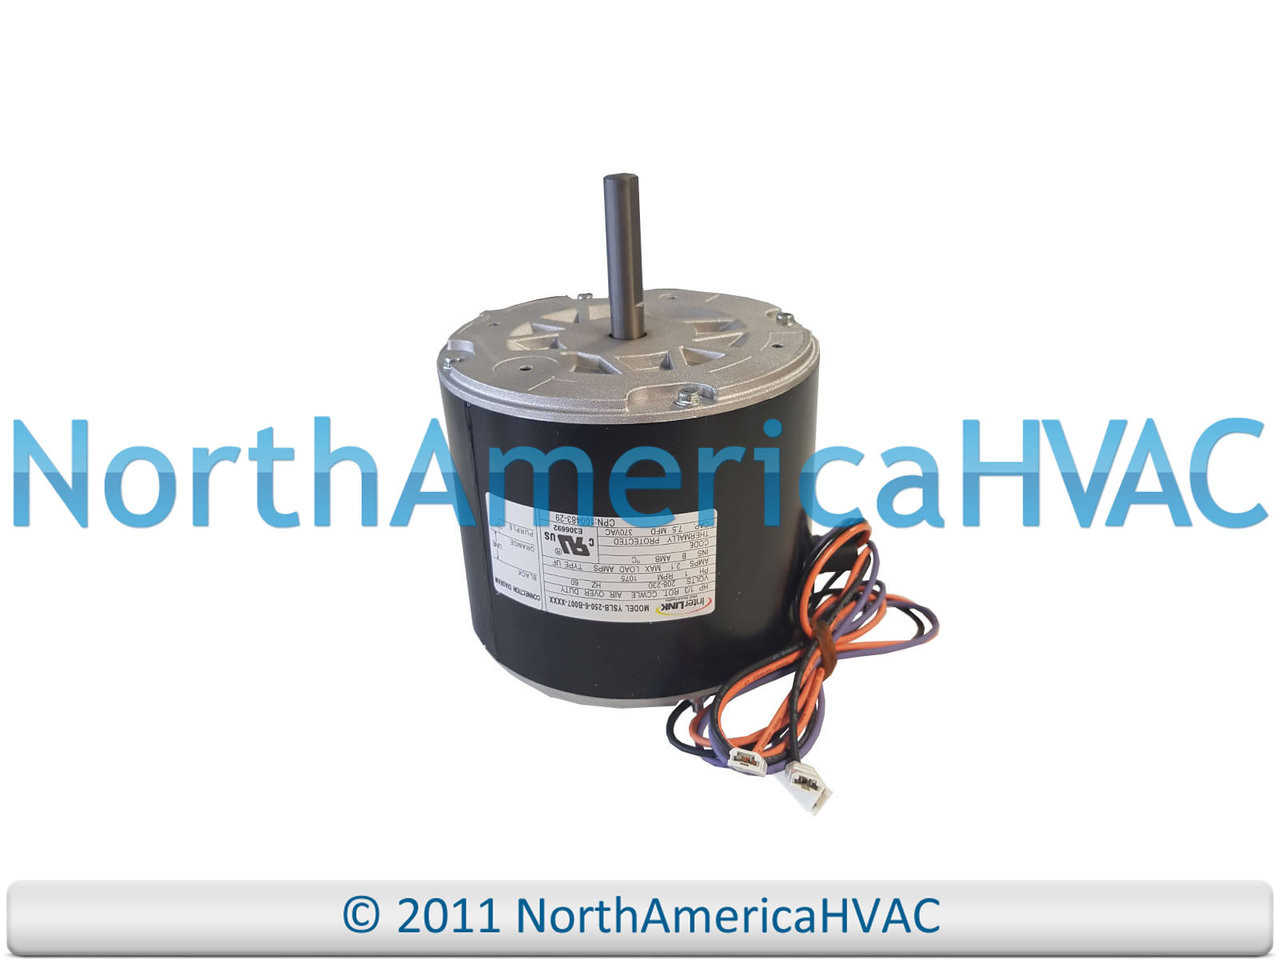 Oem Emerson 1 3 Hp 208 230v Condenser Fan Motor K55hxltc 0248 Ecm Wiring Diagram 0 Larger More Photos